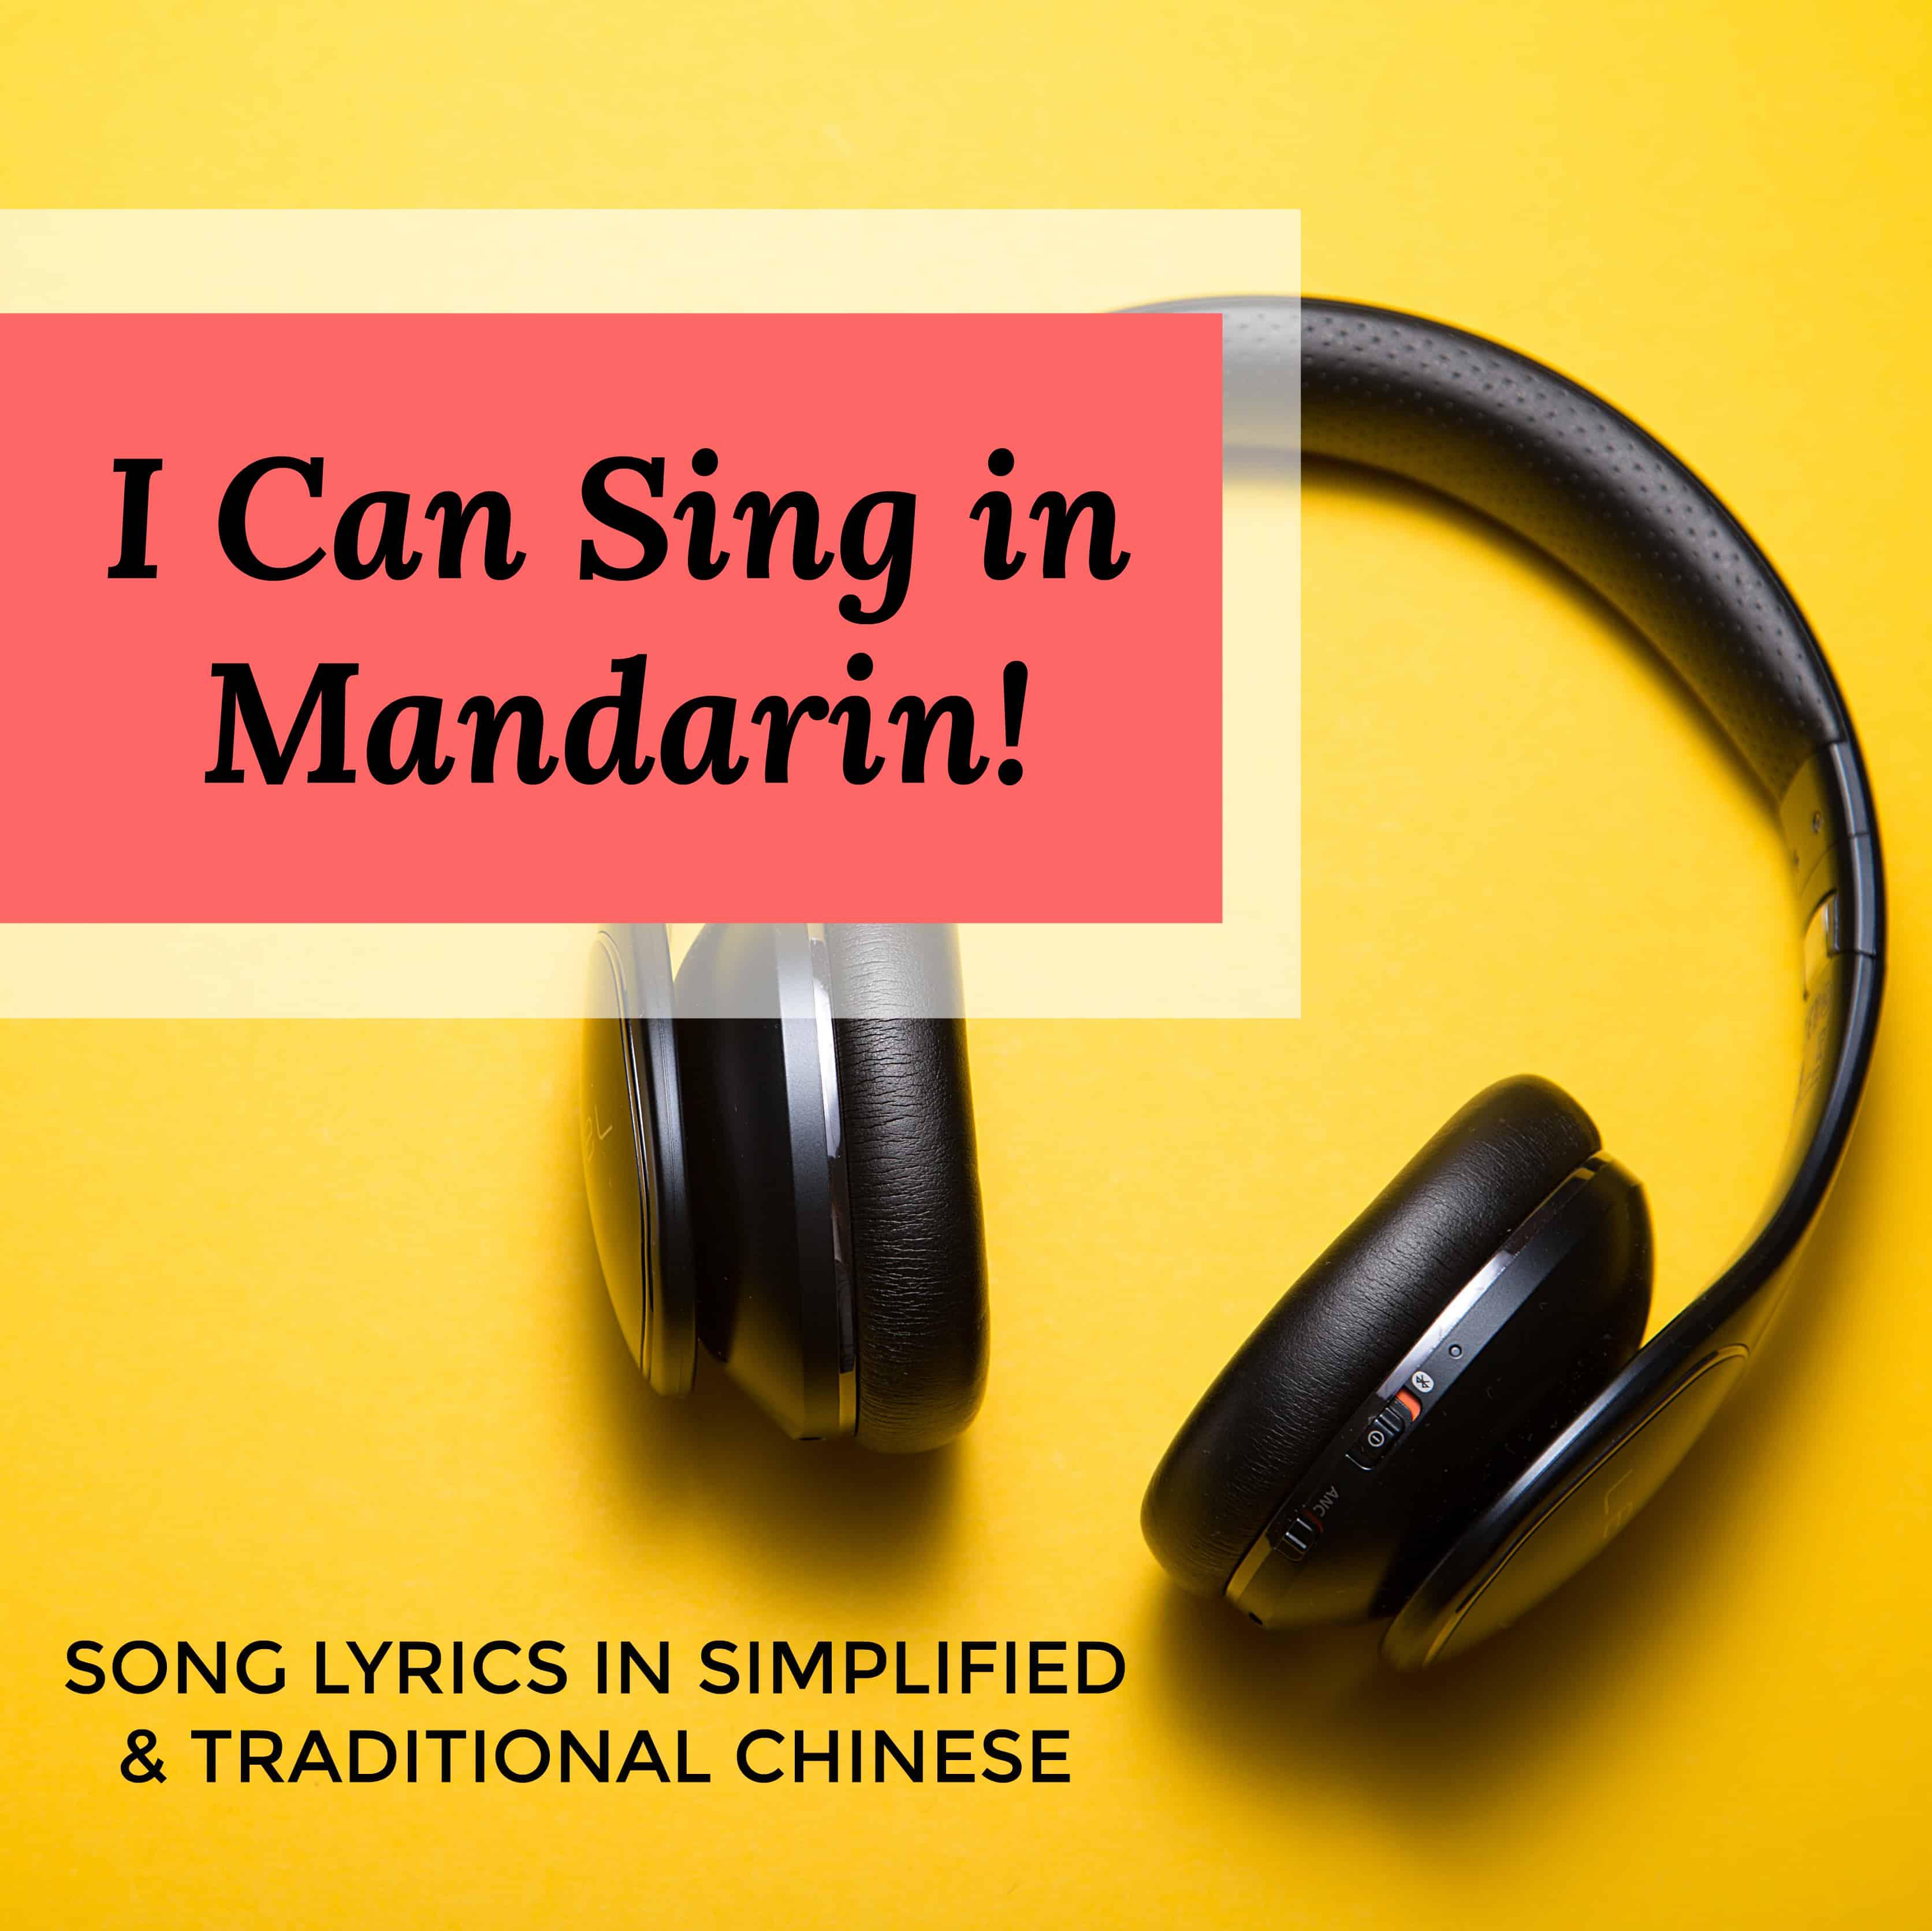 I CAN SING IN MANDARIN LYRICS